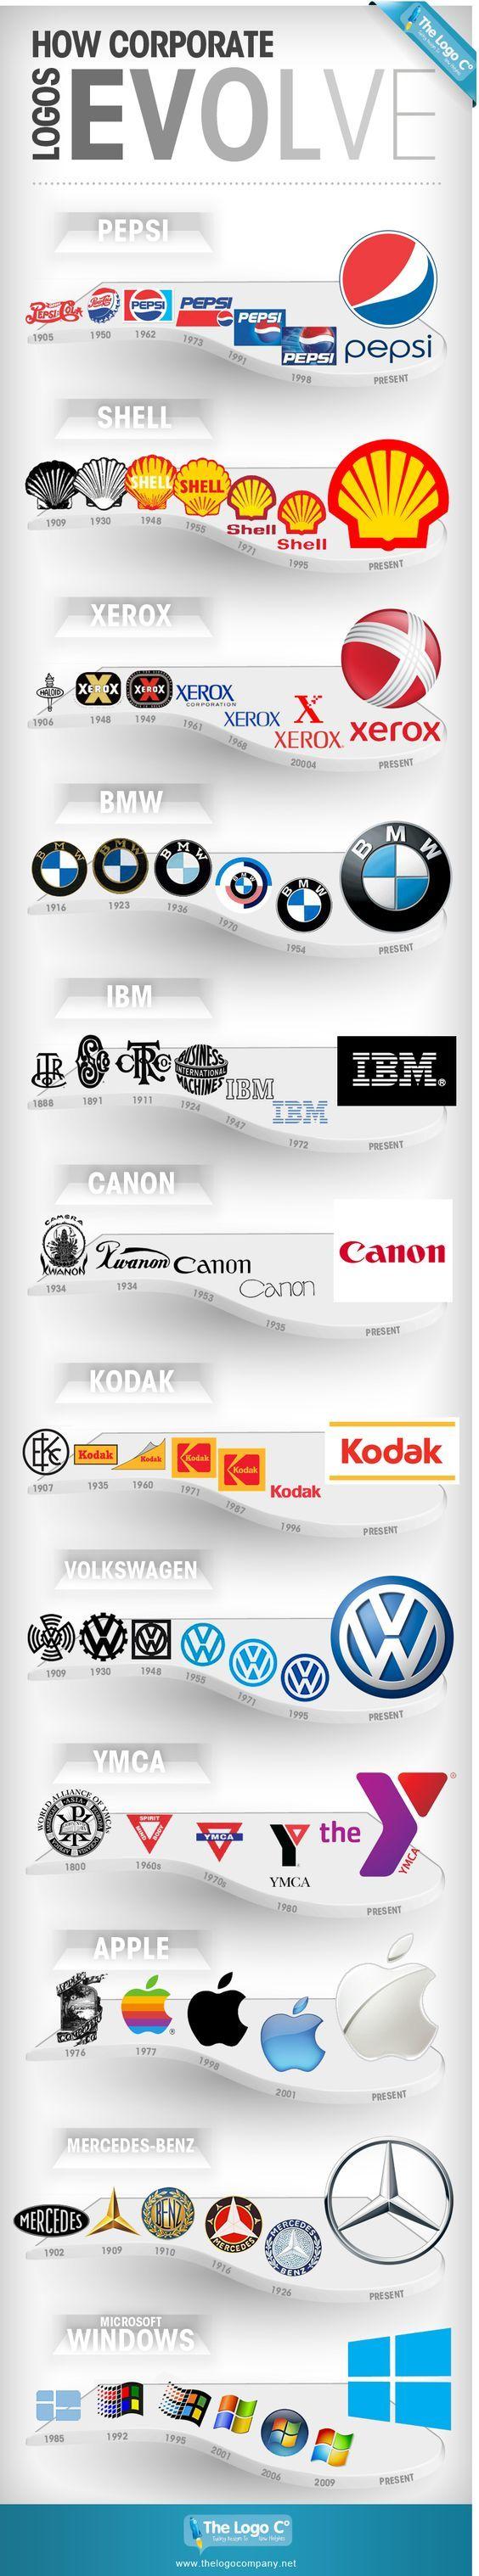 How Corporate Logos Evolve: